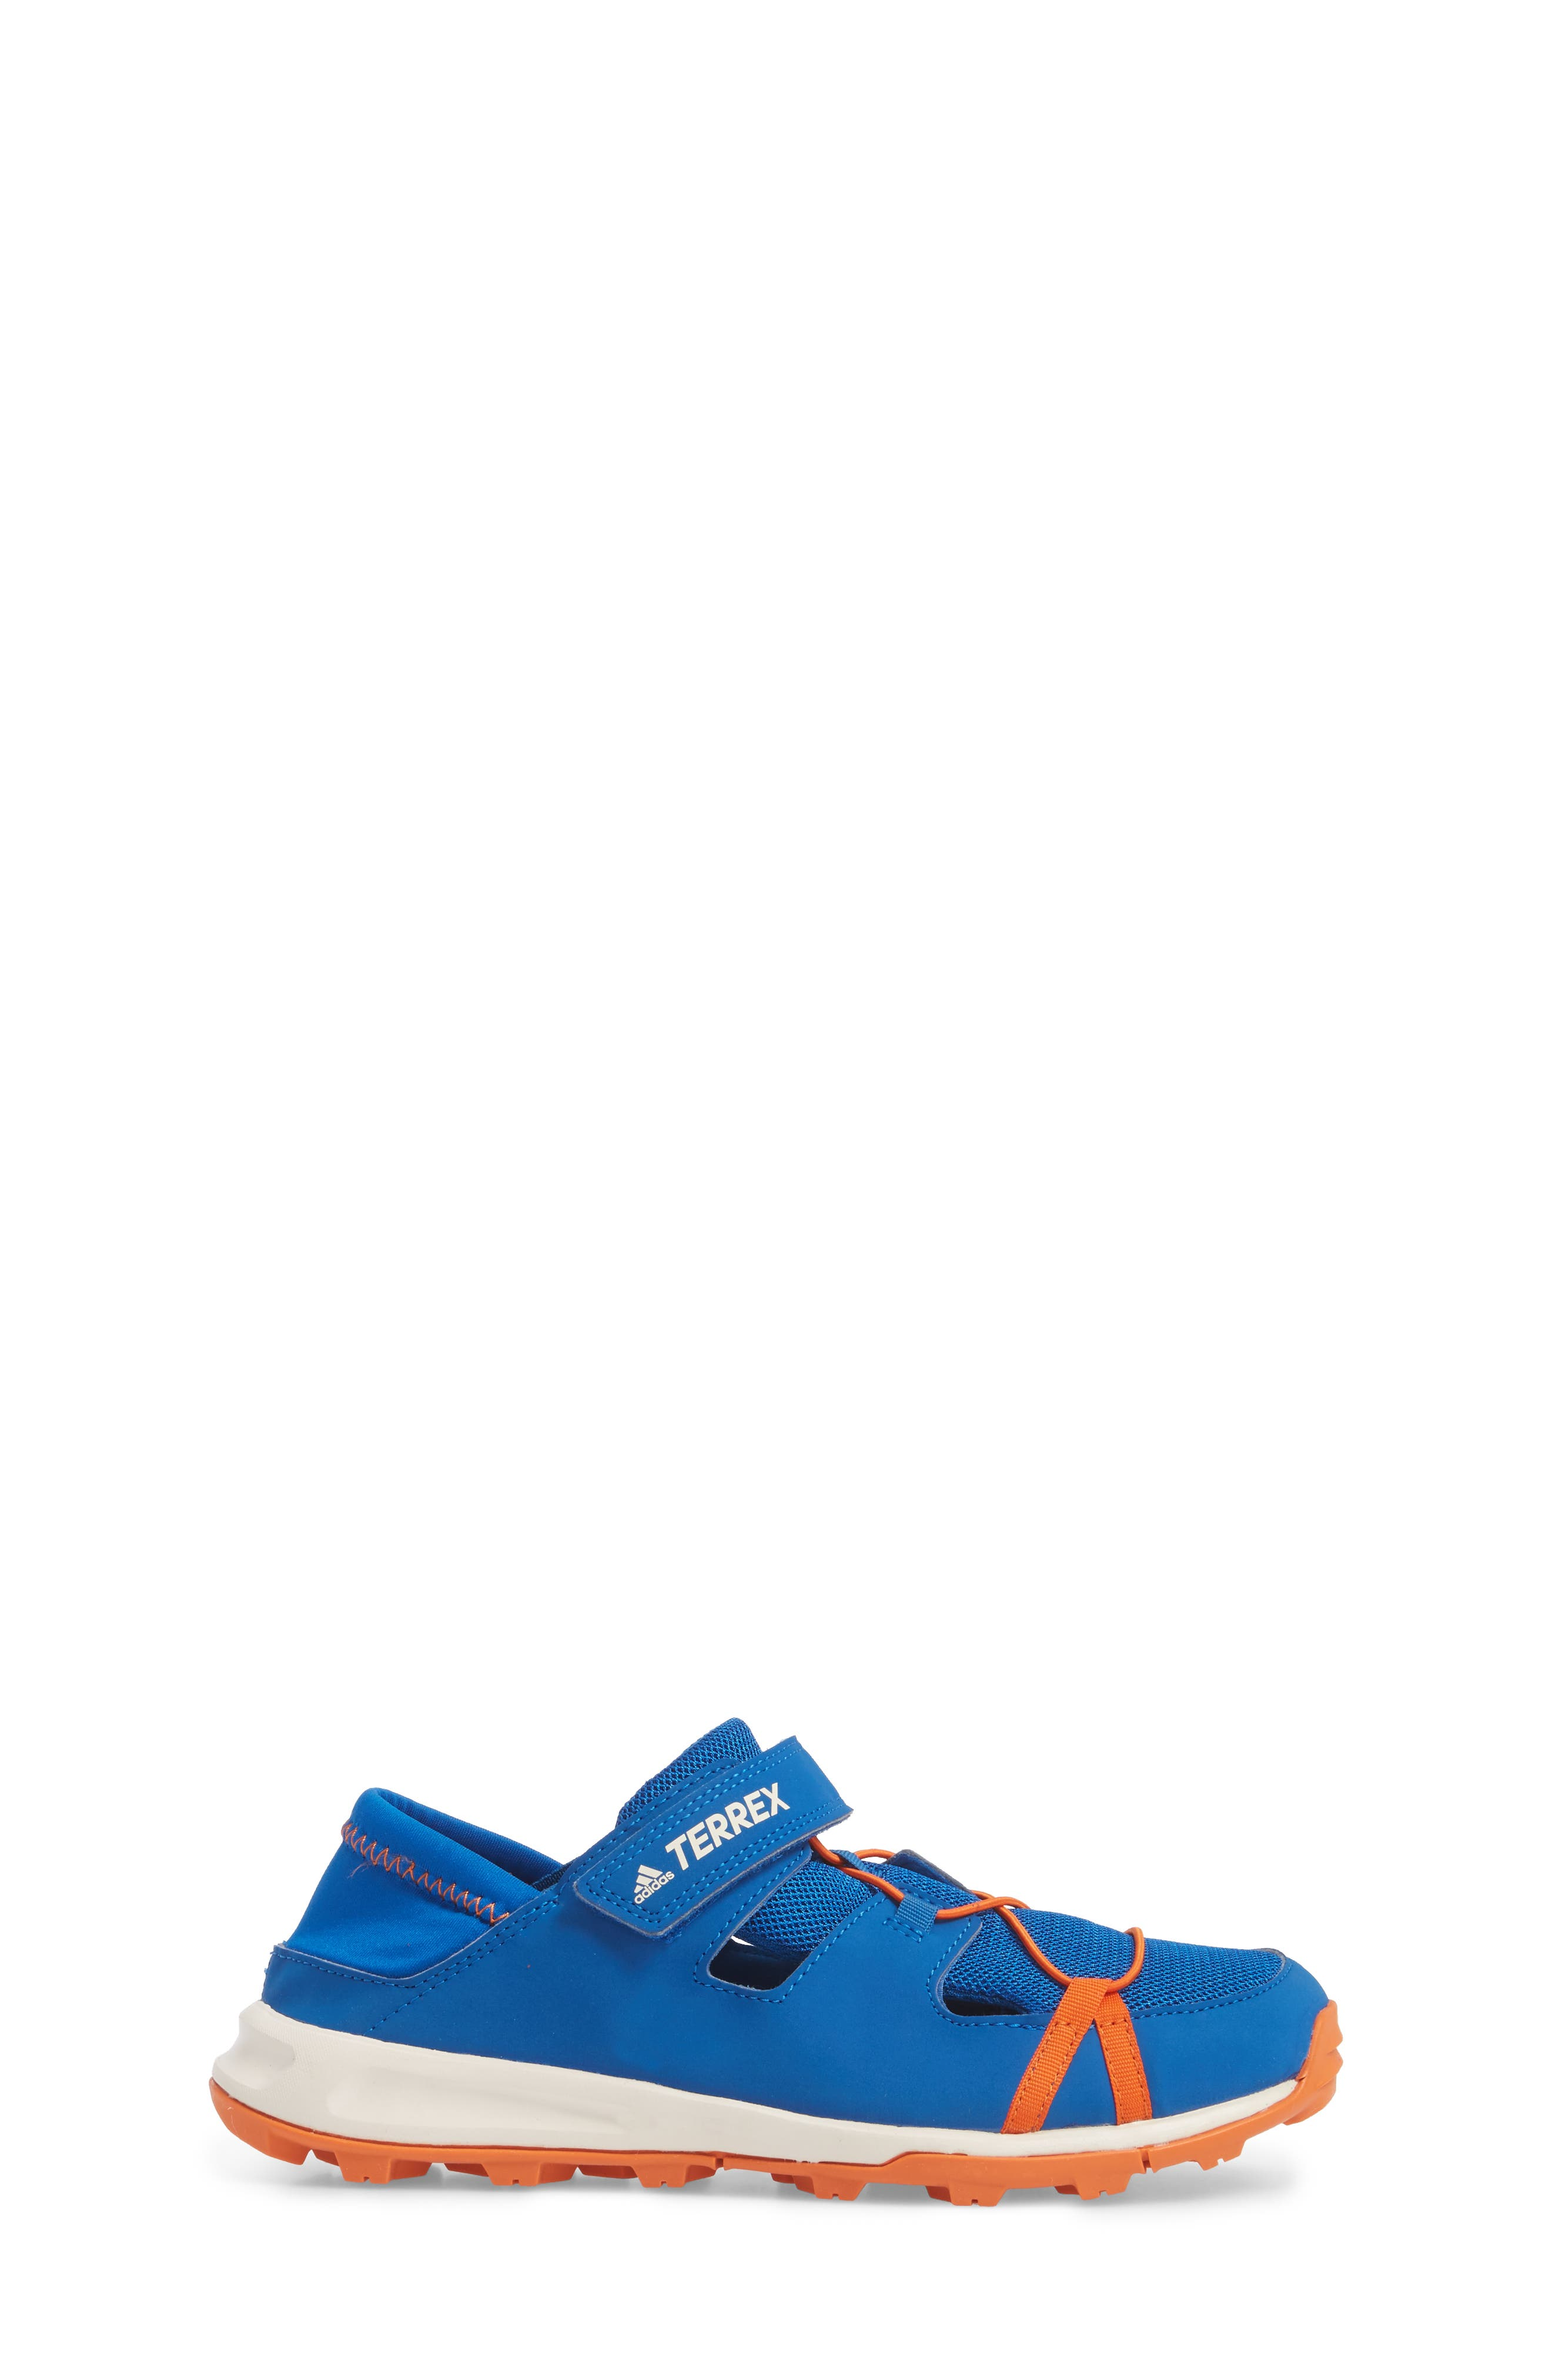 Terrex Tivid Sneaker,                             Alternate thumbnail 3, color,                             Blue/ Orange/ Chalk White